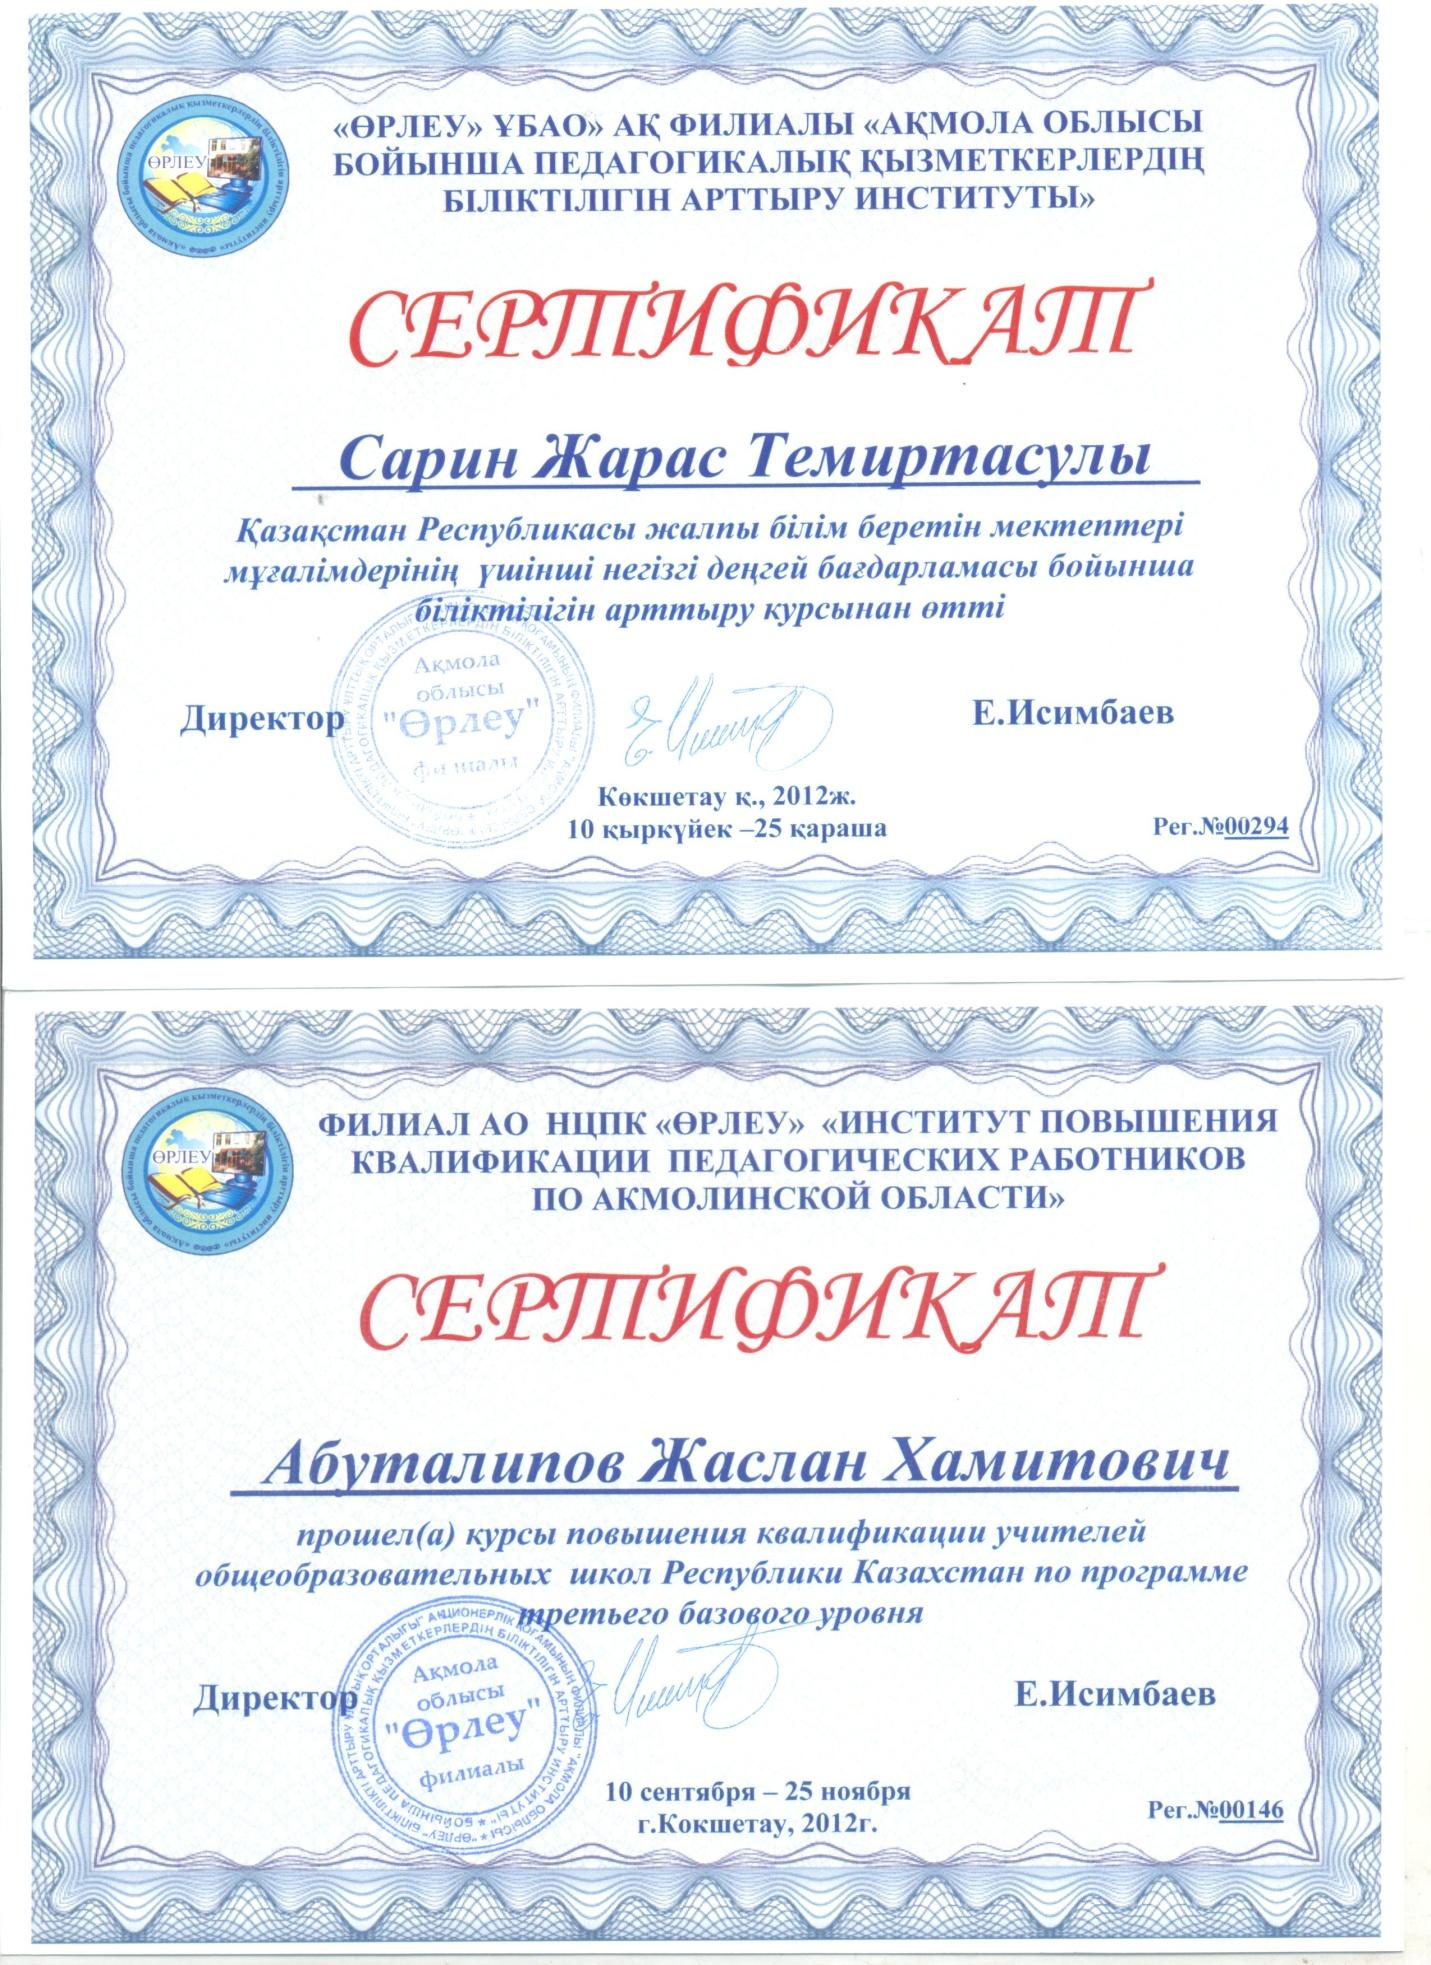 C:\Documents and Settings\админ\Рабочий стол\сертификаты 3х курсов\сертиф Абуталипов и Сарин.JPG